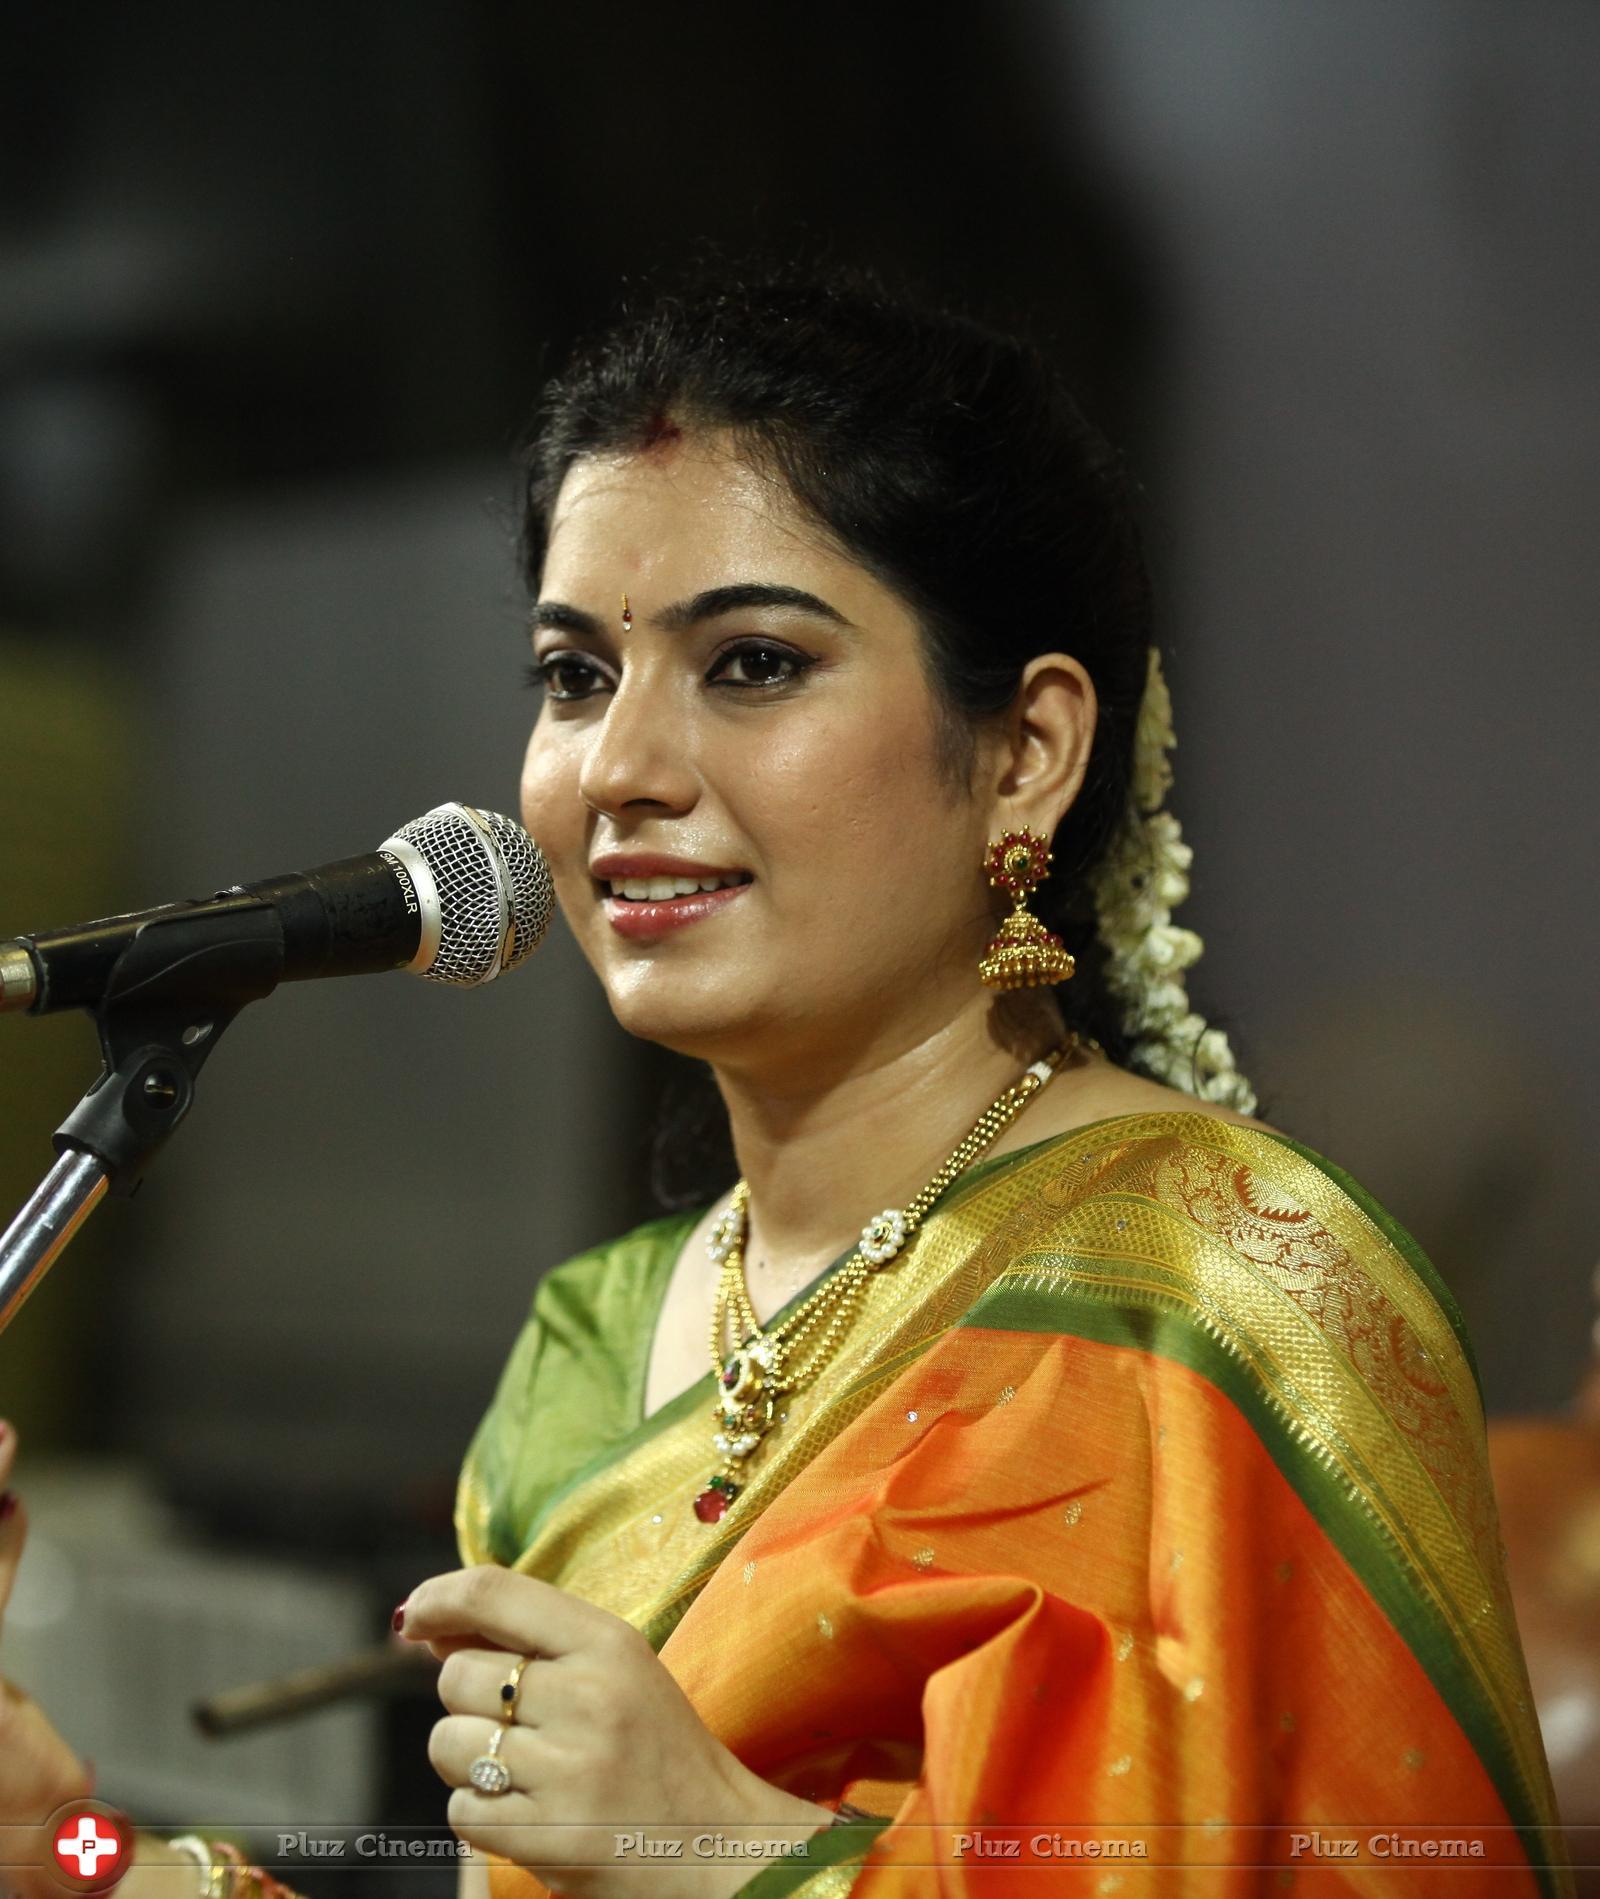 I Love You Naga Amma: Shobana Vignesh Photos